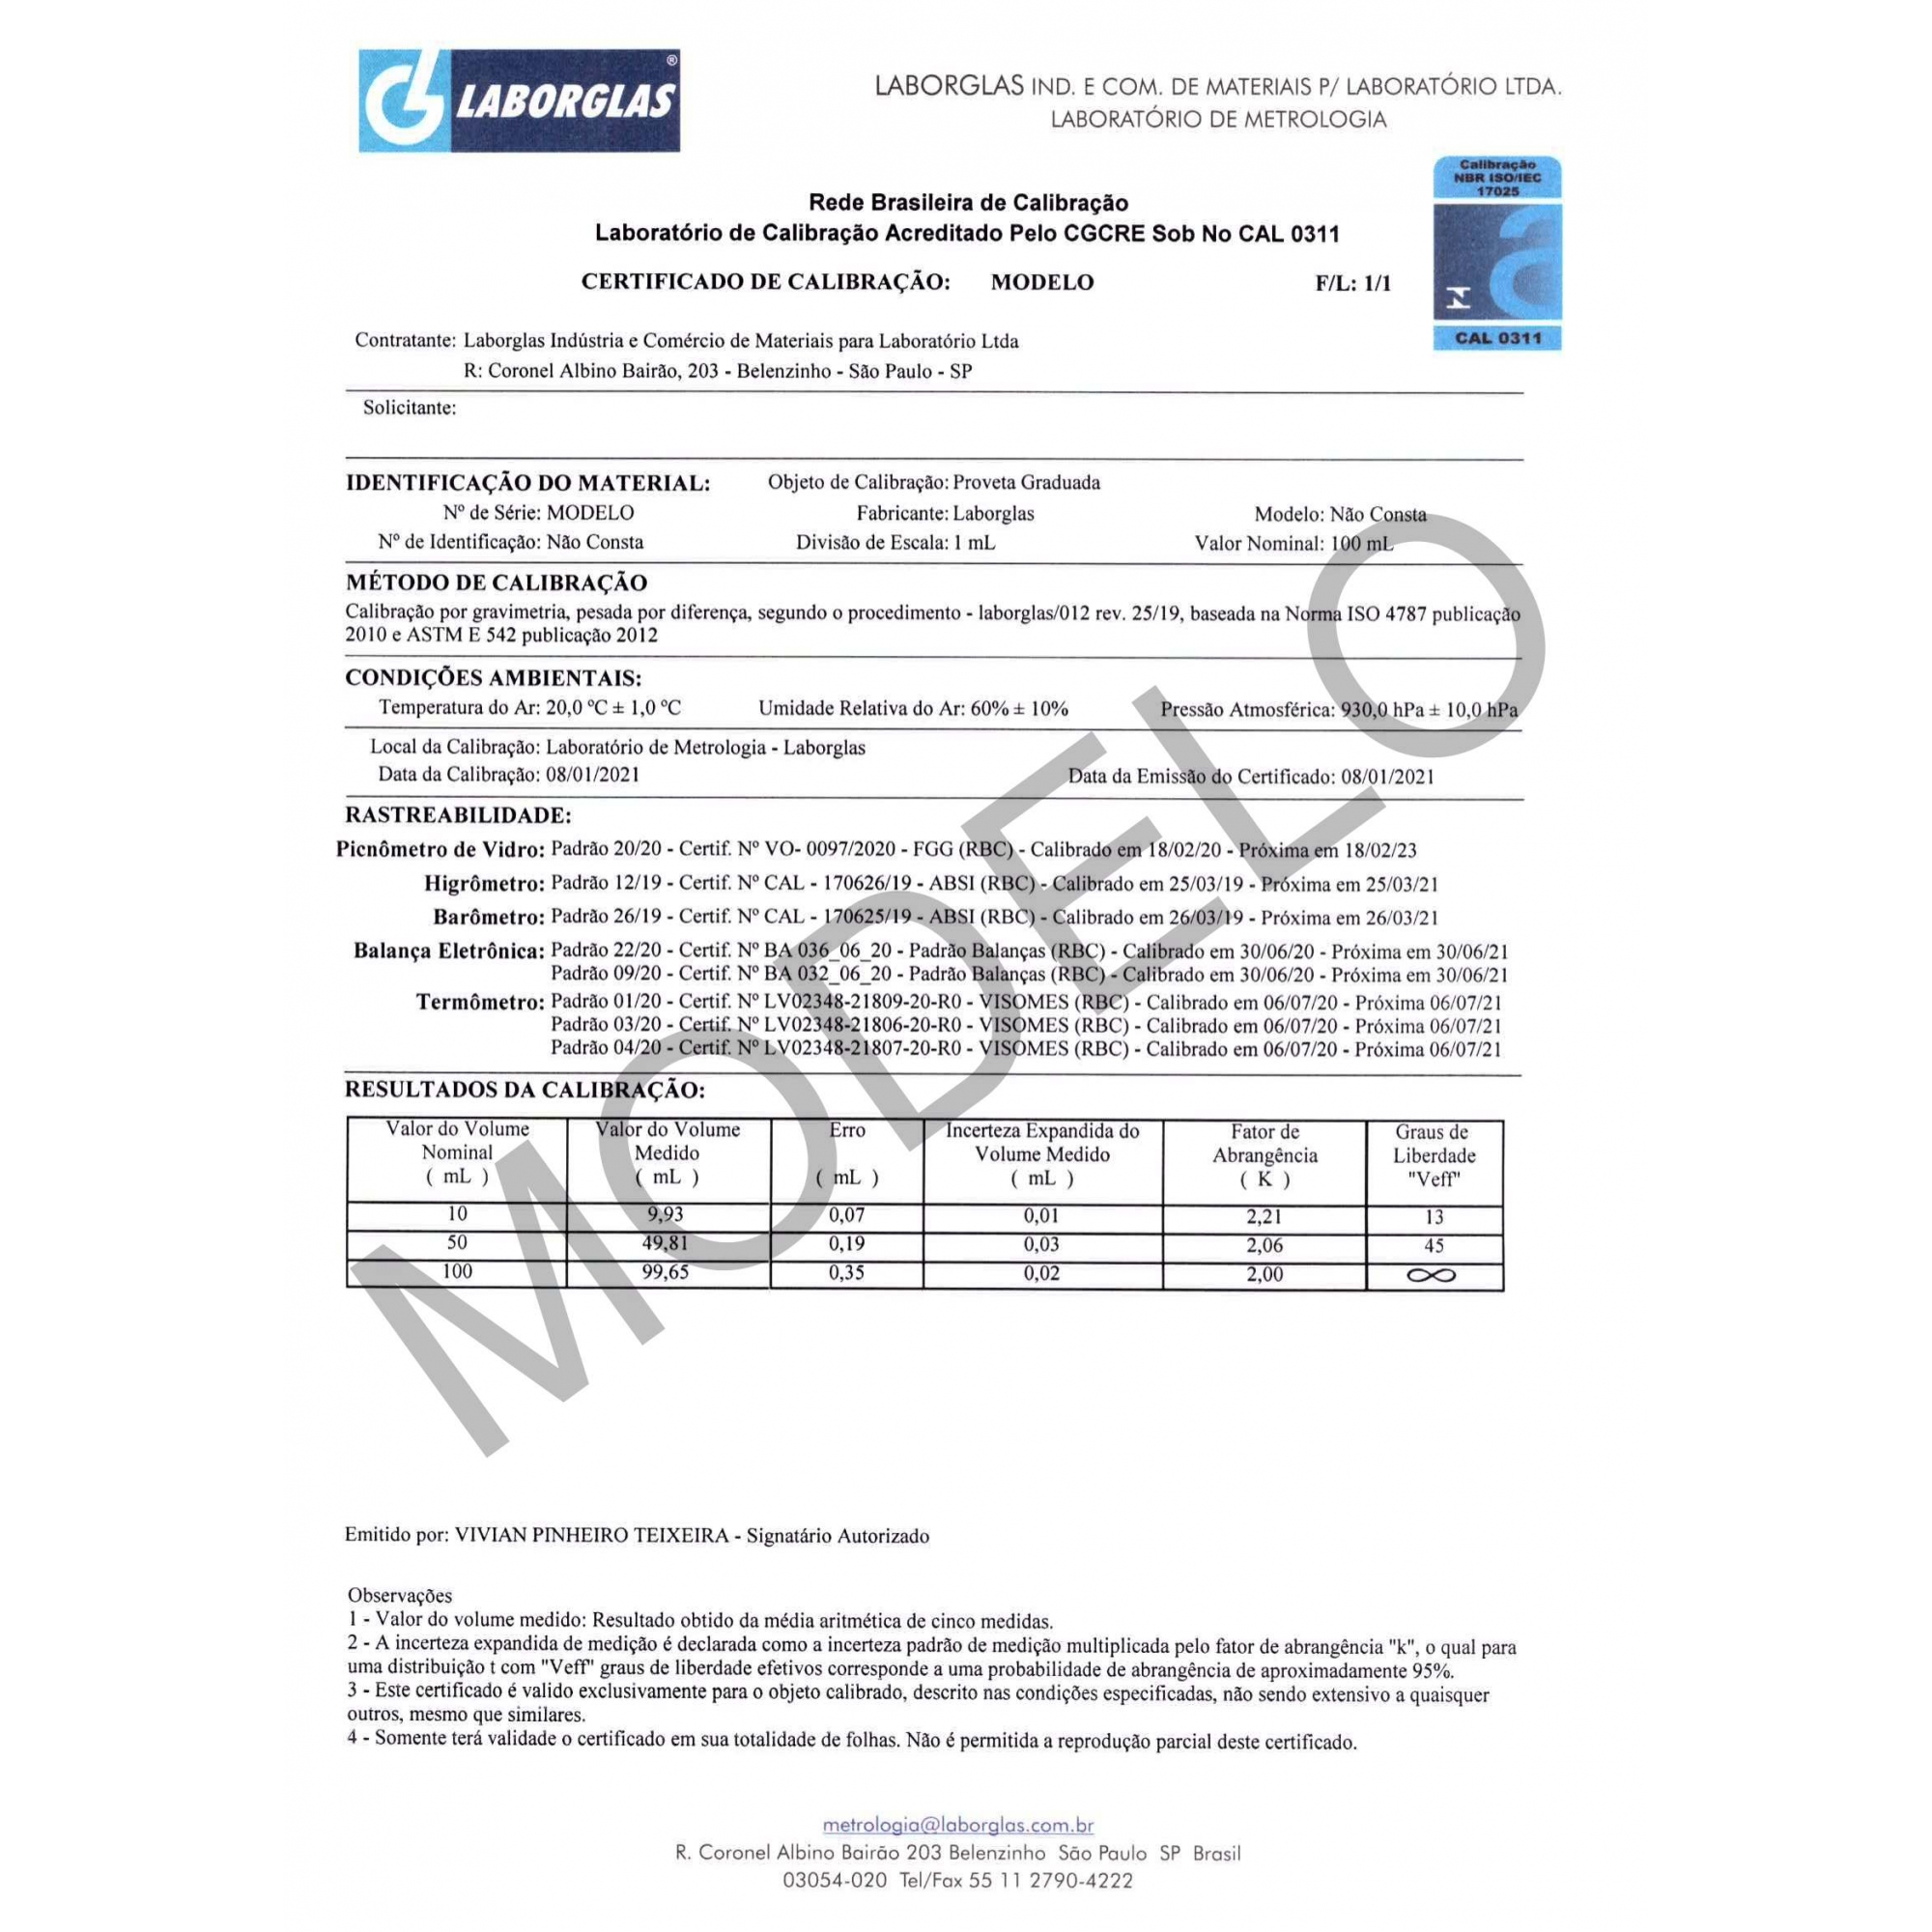 PROVETA GRADUADA BASE HEXAGONAL DE POLIPROPILENO 1000 ML CLASSE A CERTIFICADO RBC - Laborglas - Cód. 9138754-R